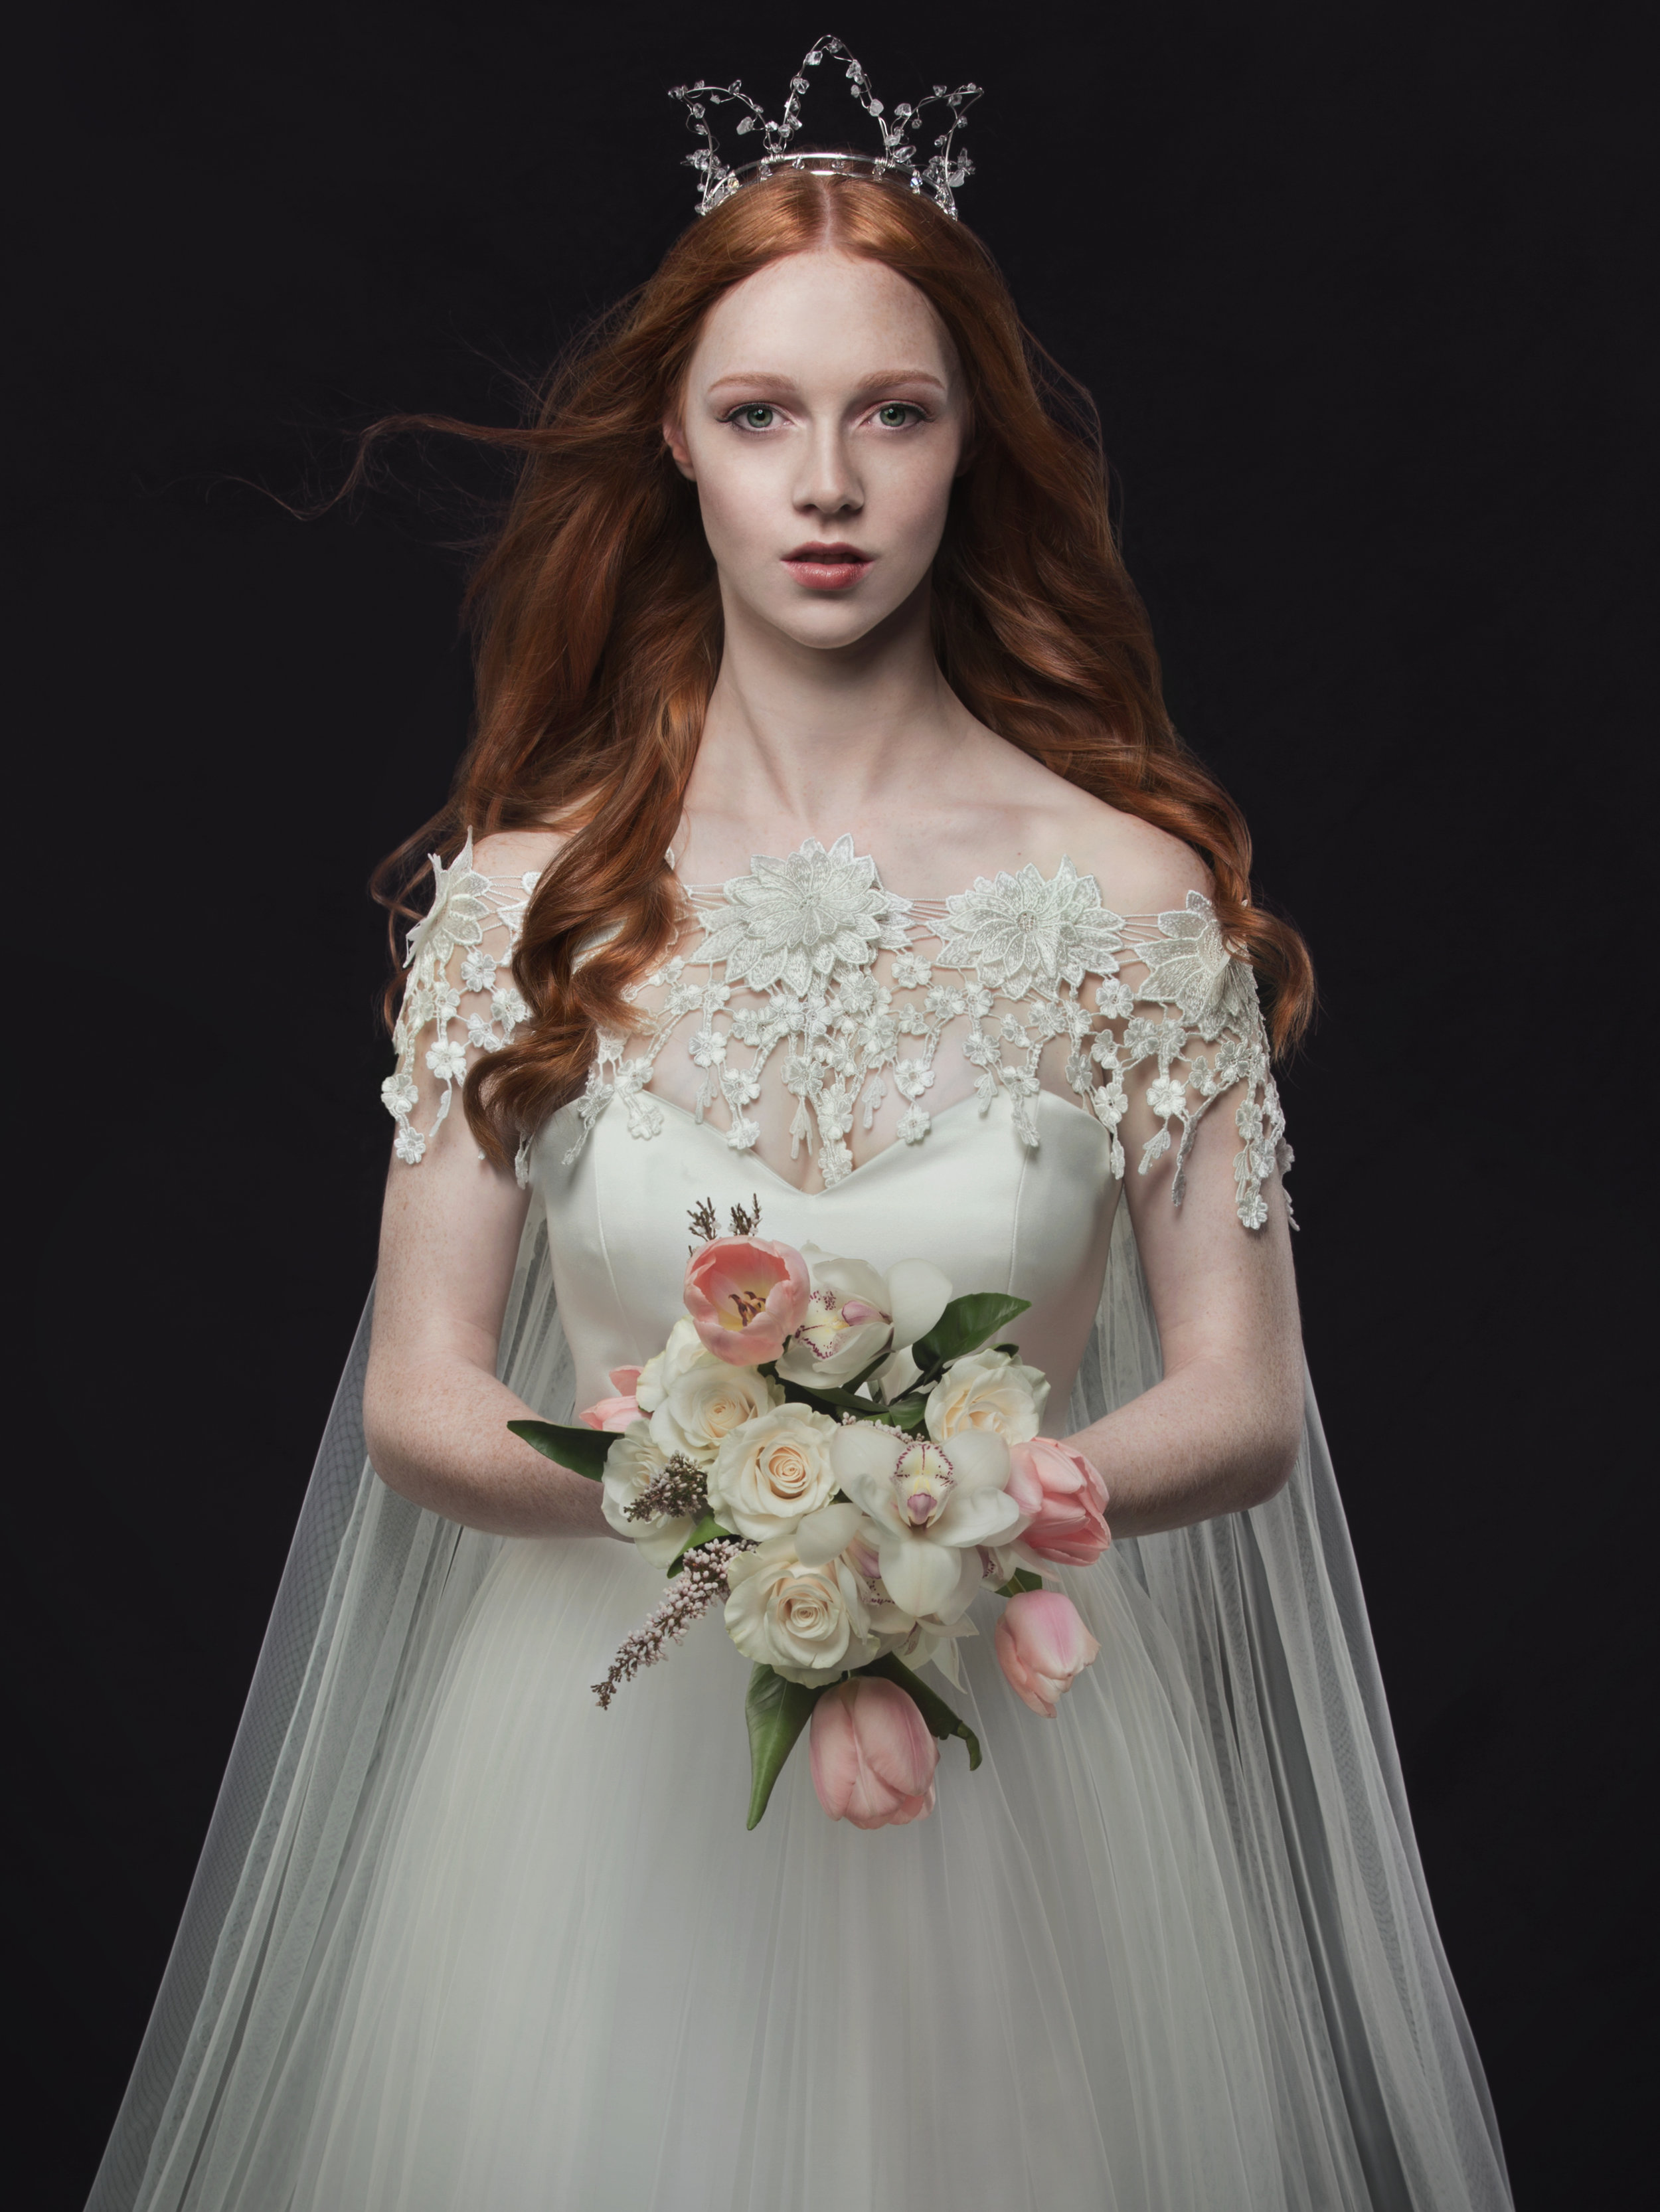 Fieulaine-Fine-Art-Bridal_Katy02-6.jpg